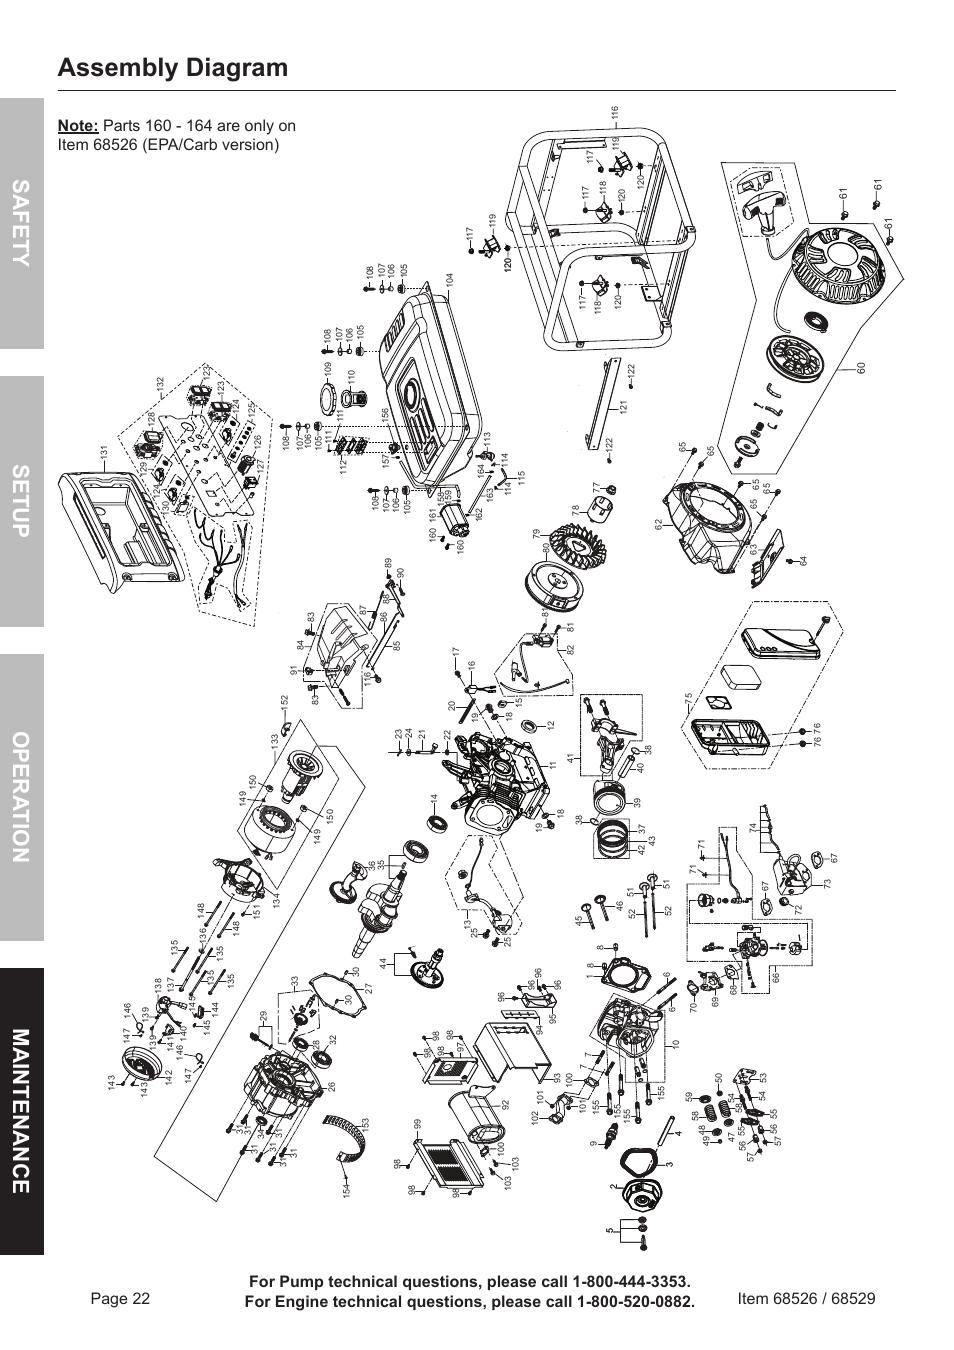 assembly diagram  safety o pera tion m aintenance setup